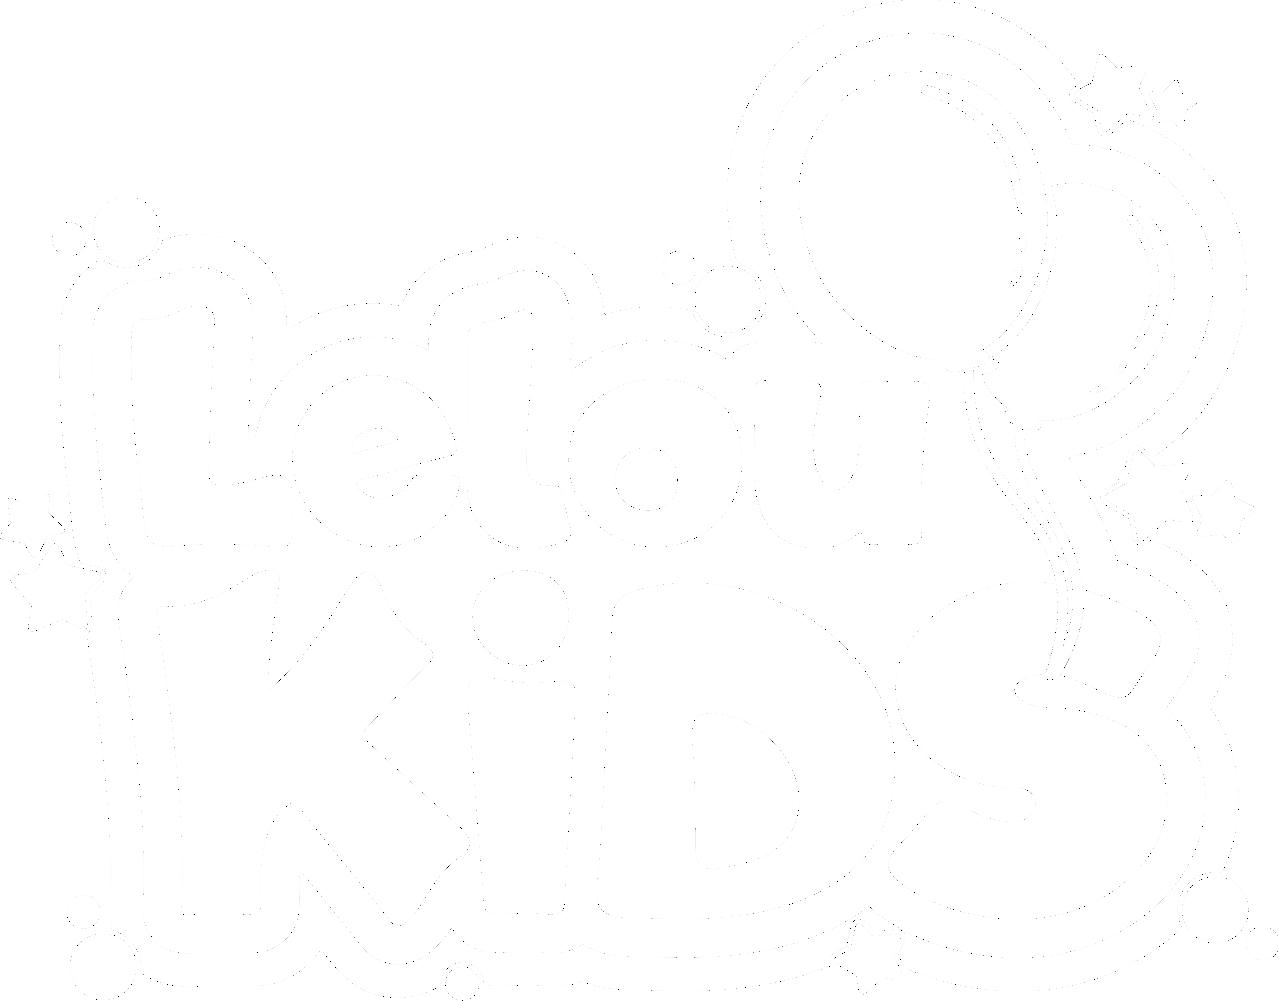 Leloukids